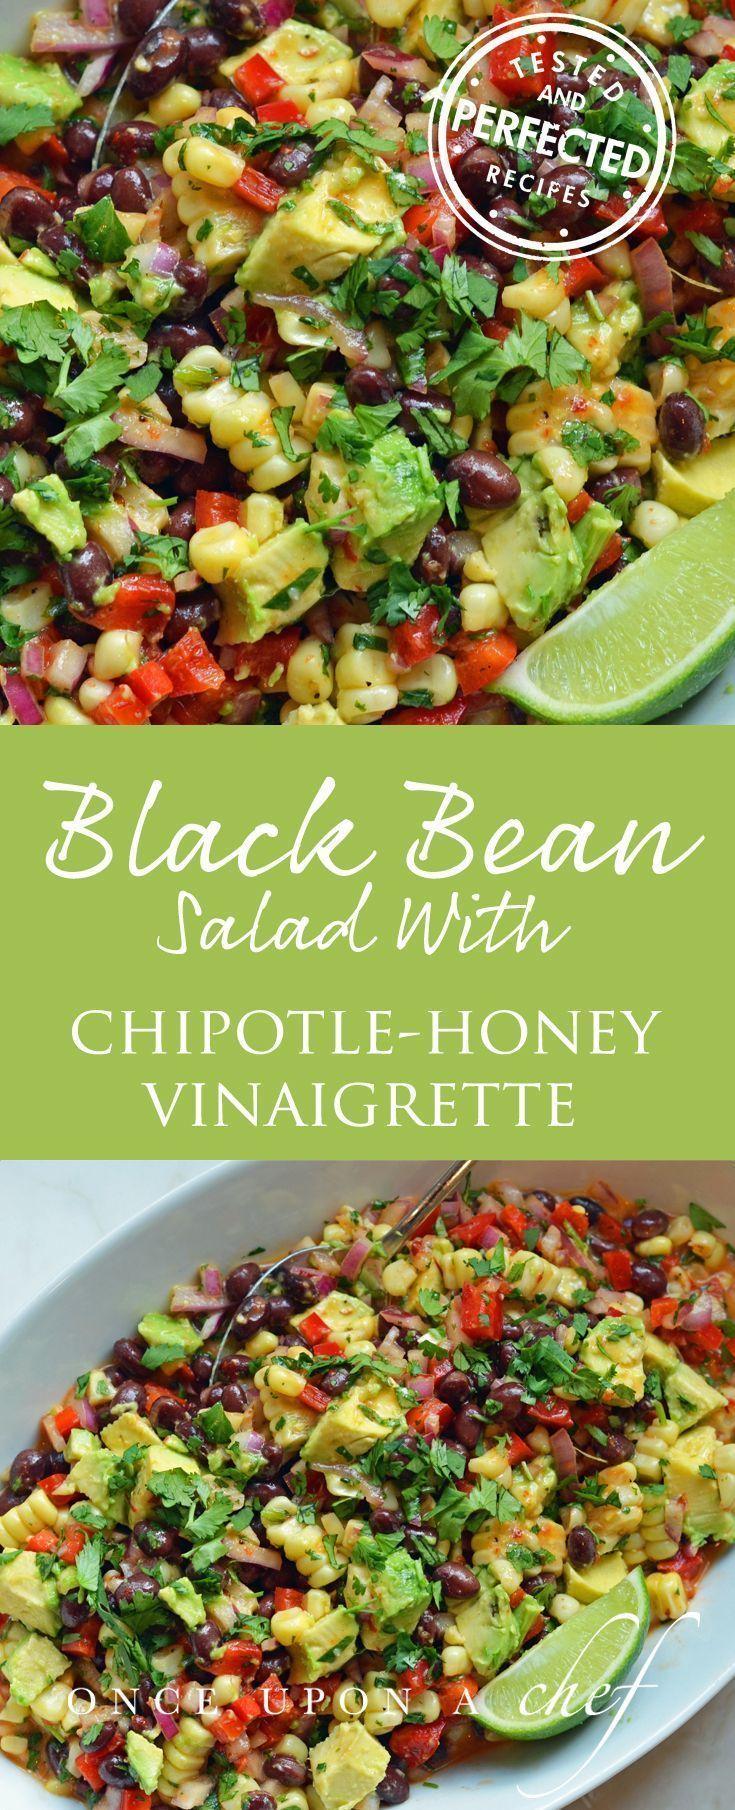 Black Bean & Corn Salad with Chipotle-Honey Vinaigrette